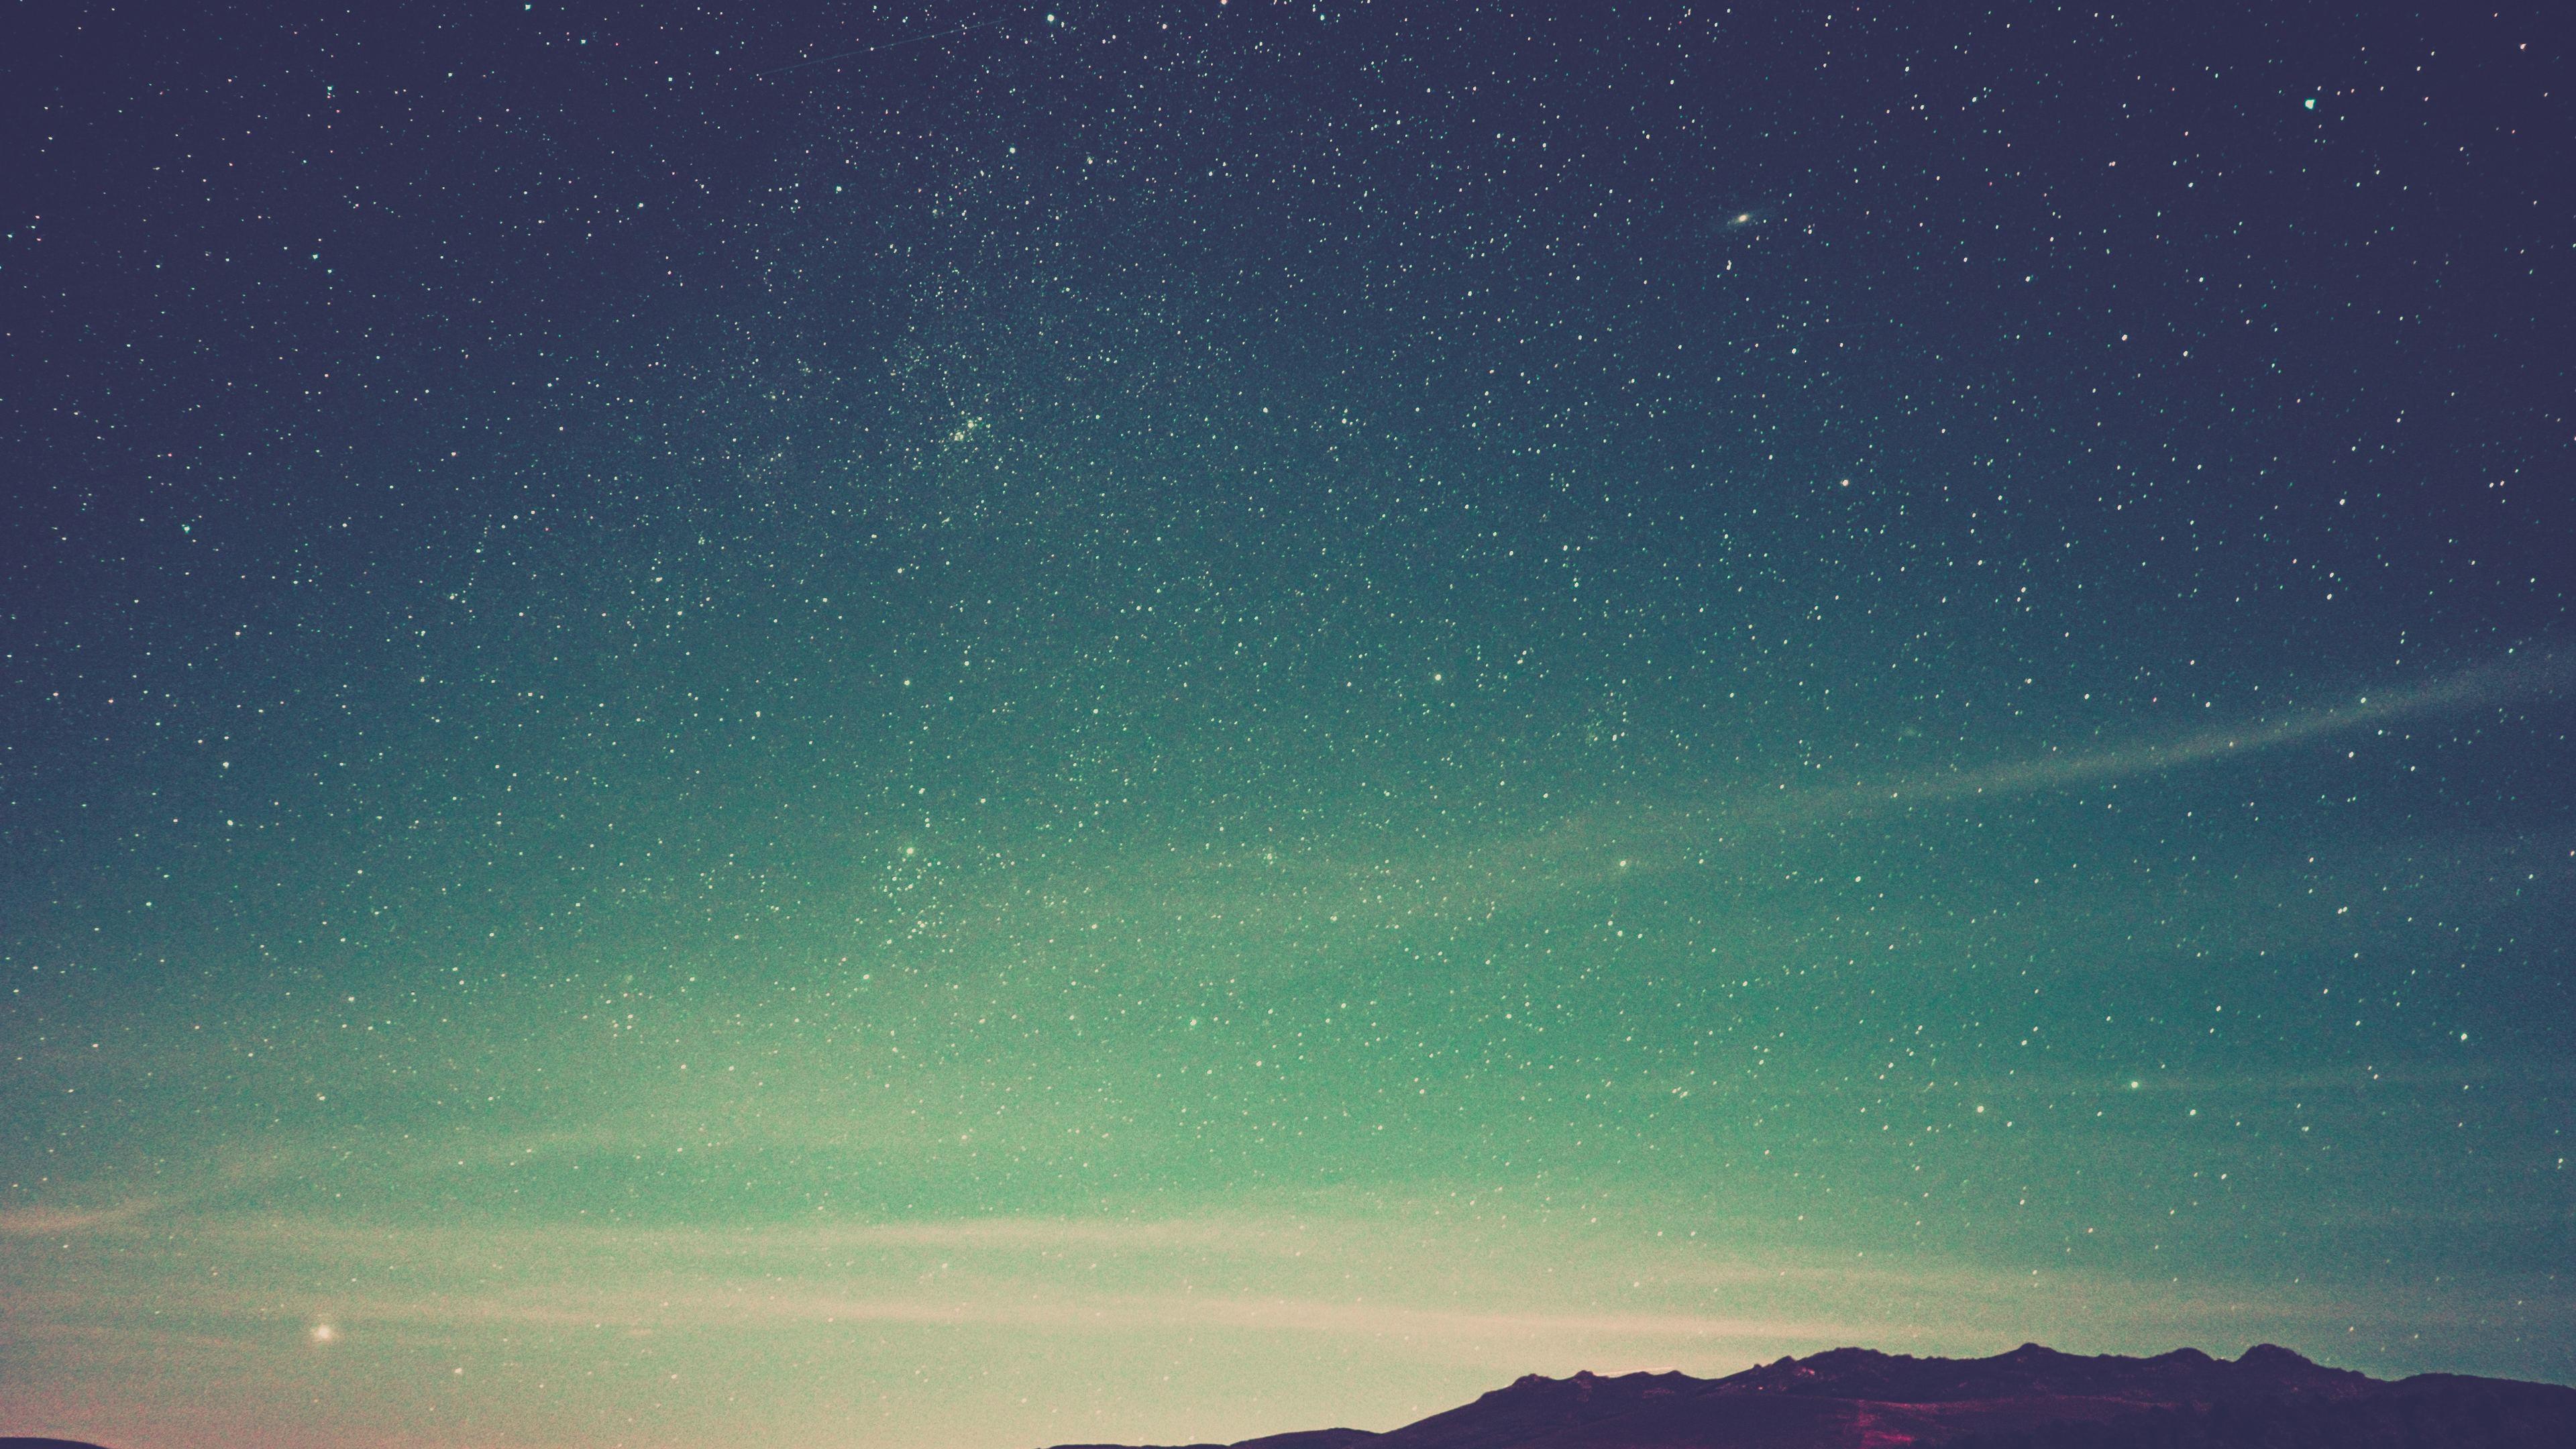 starry night landscape mountains 1540136613 - Starry Night Landscape Mountains - stars wallpapers, nature wallpapers, mountains wallpapers, landscape wallpapers, hd-wallpapers, 5k wallpapers, 4k-wallpapers